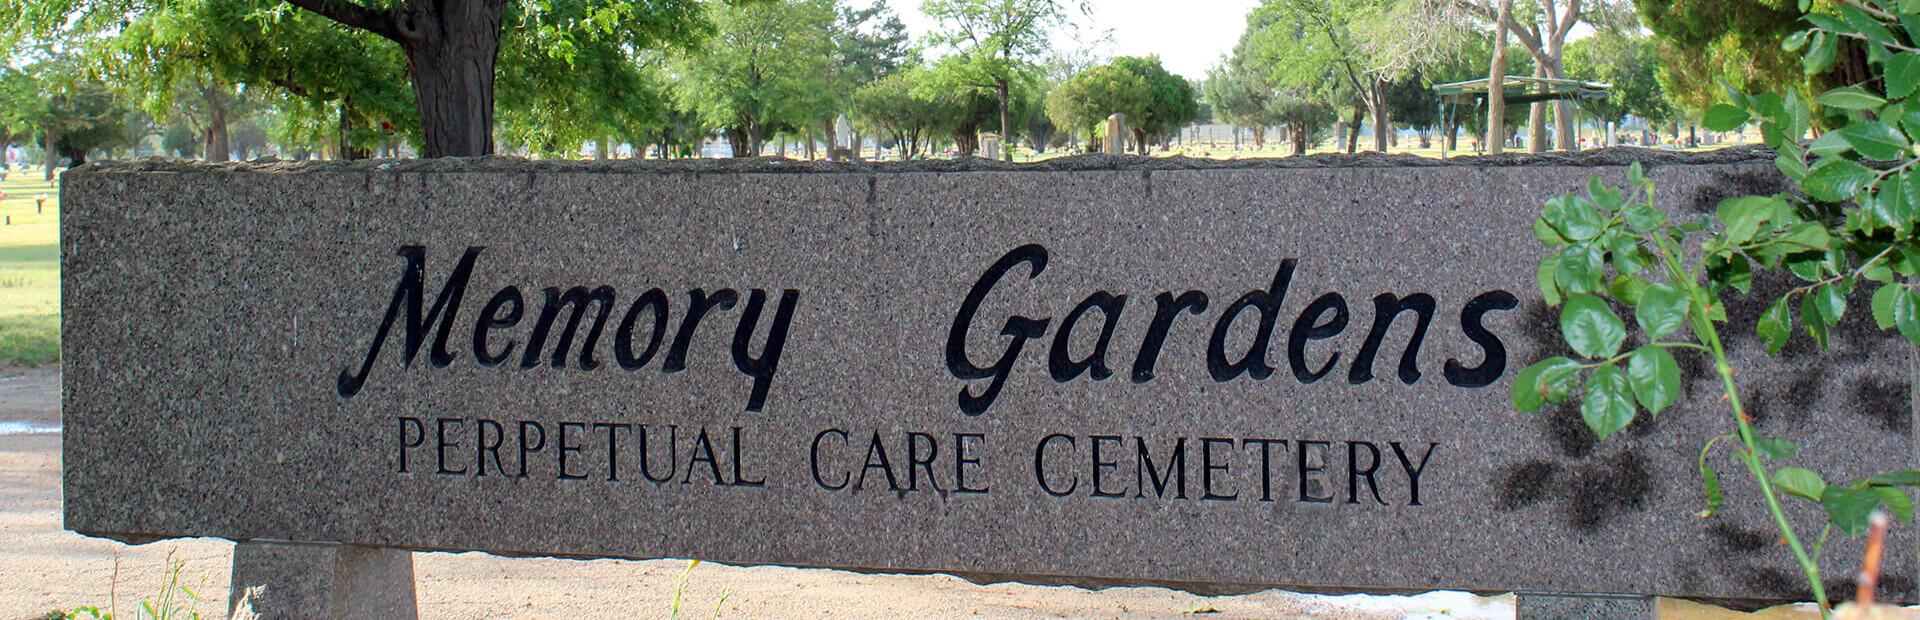 Memory Gardens of Amarillo in Amarillo, TX